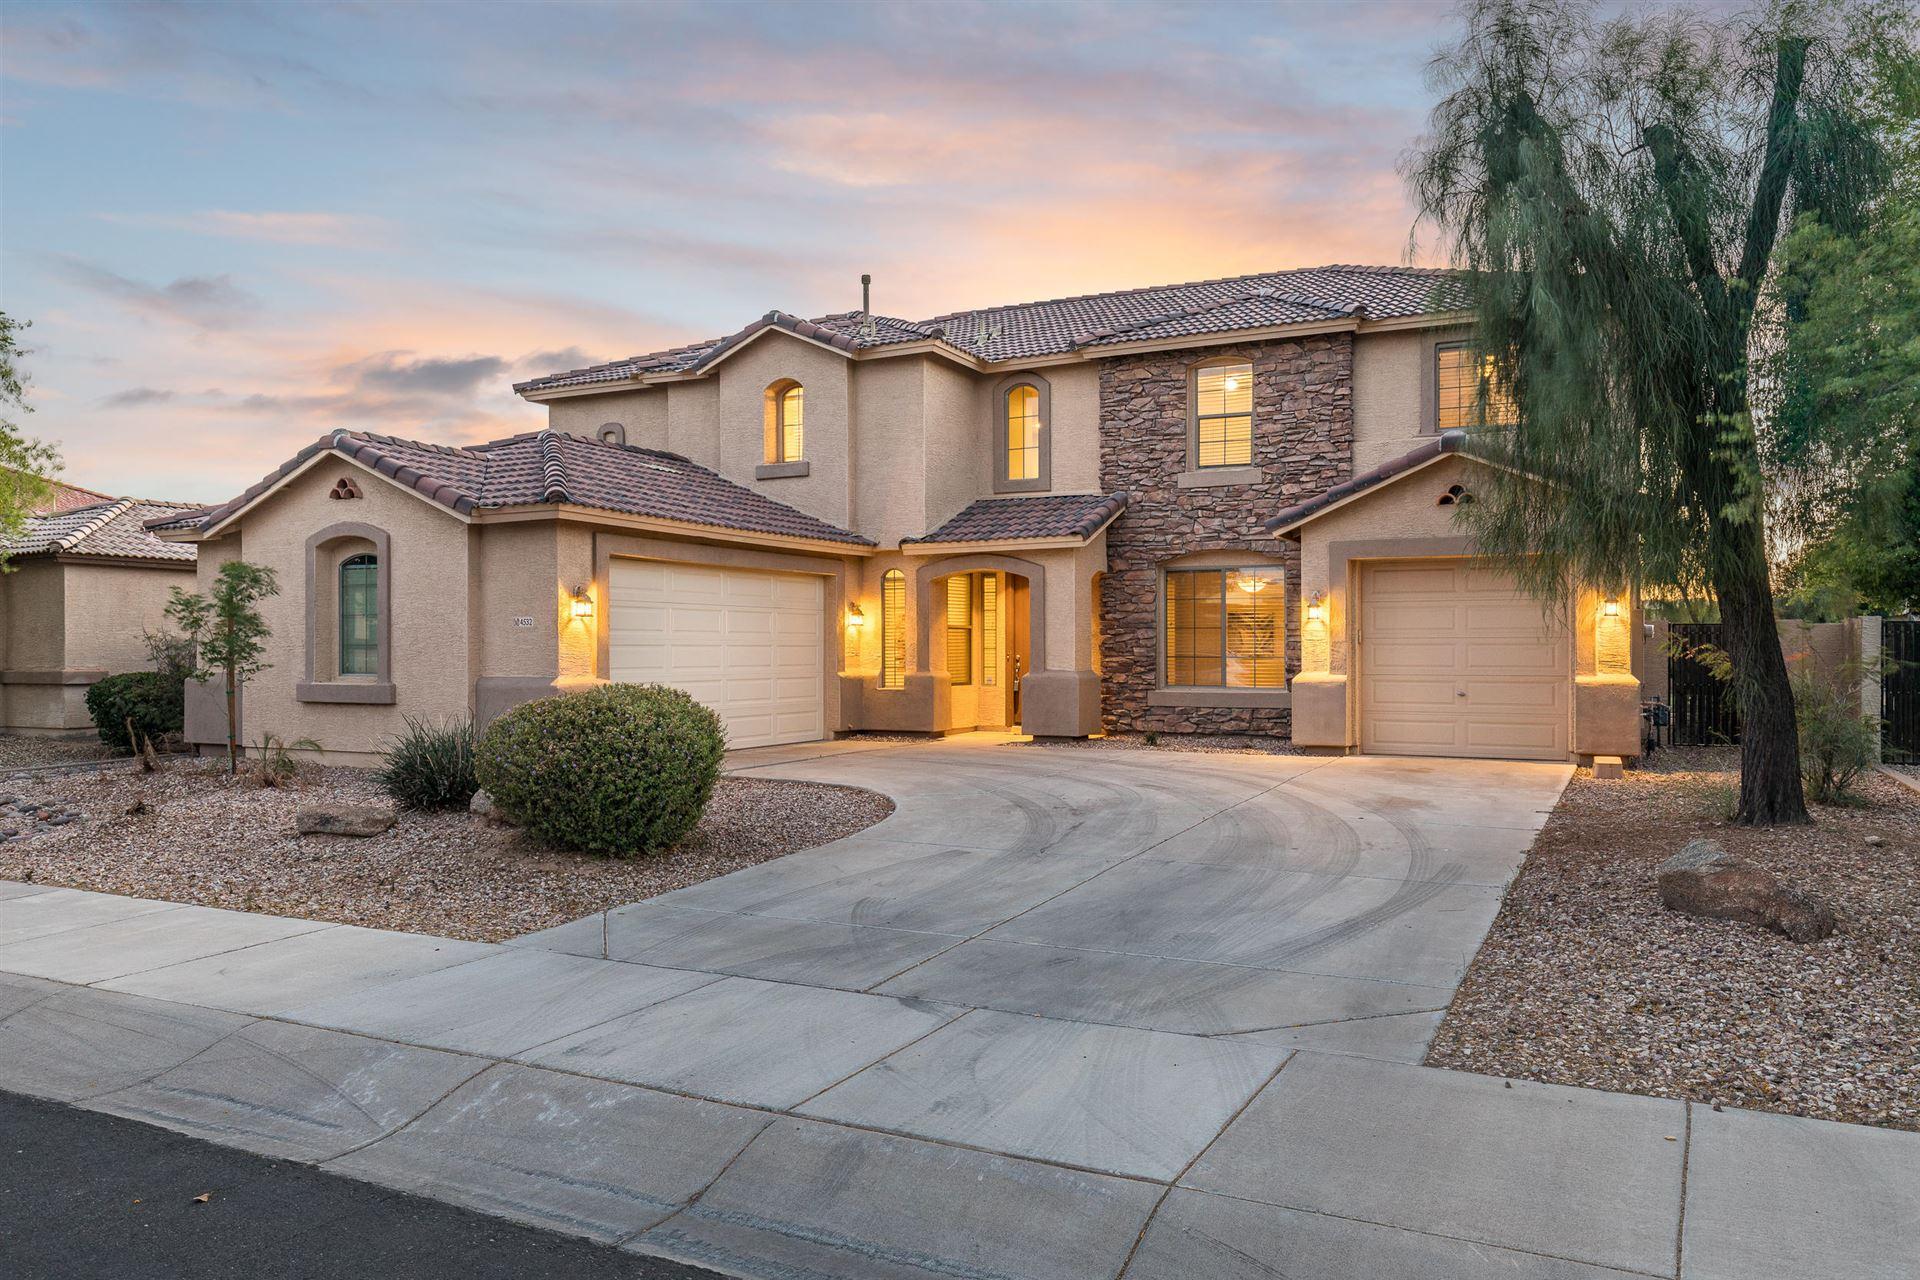 Photo of 4532 N 151ST Drive, Goodyear, AZ 85395 (MLS # 6230580)